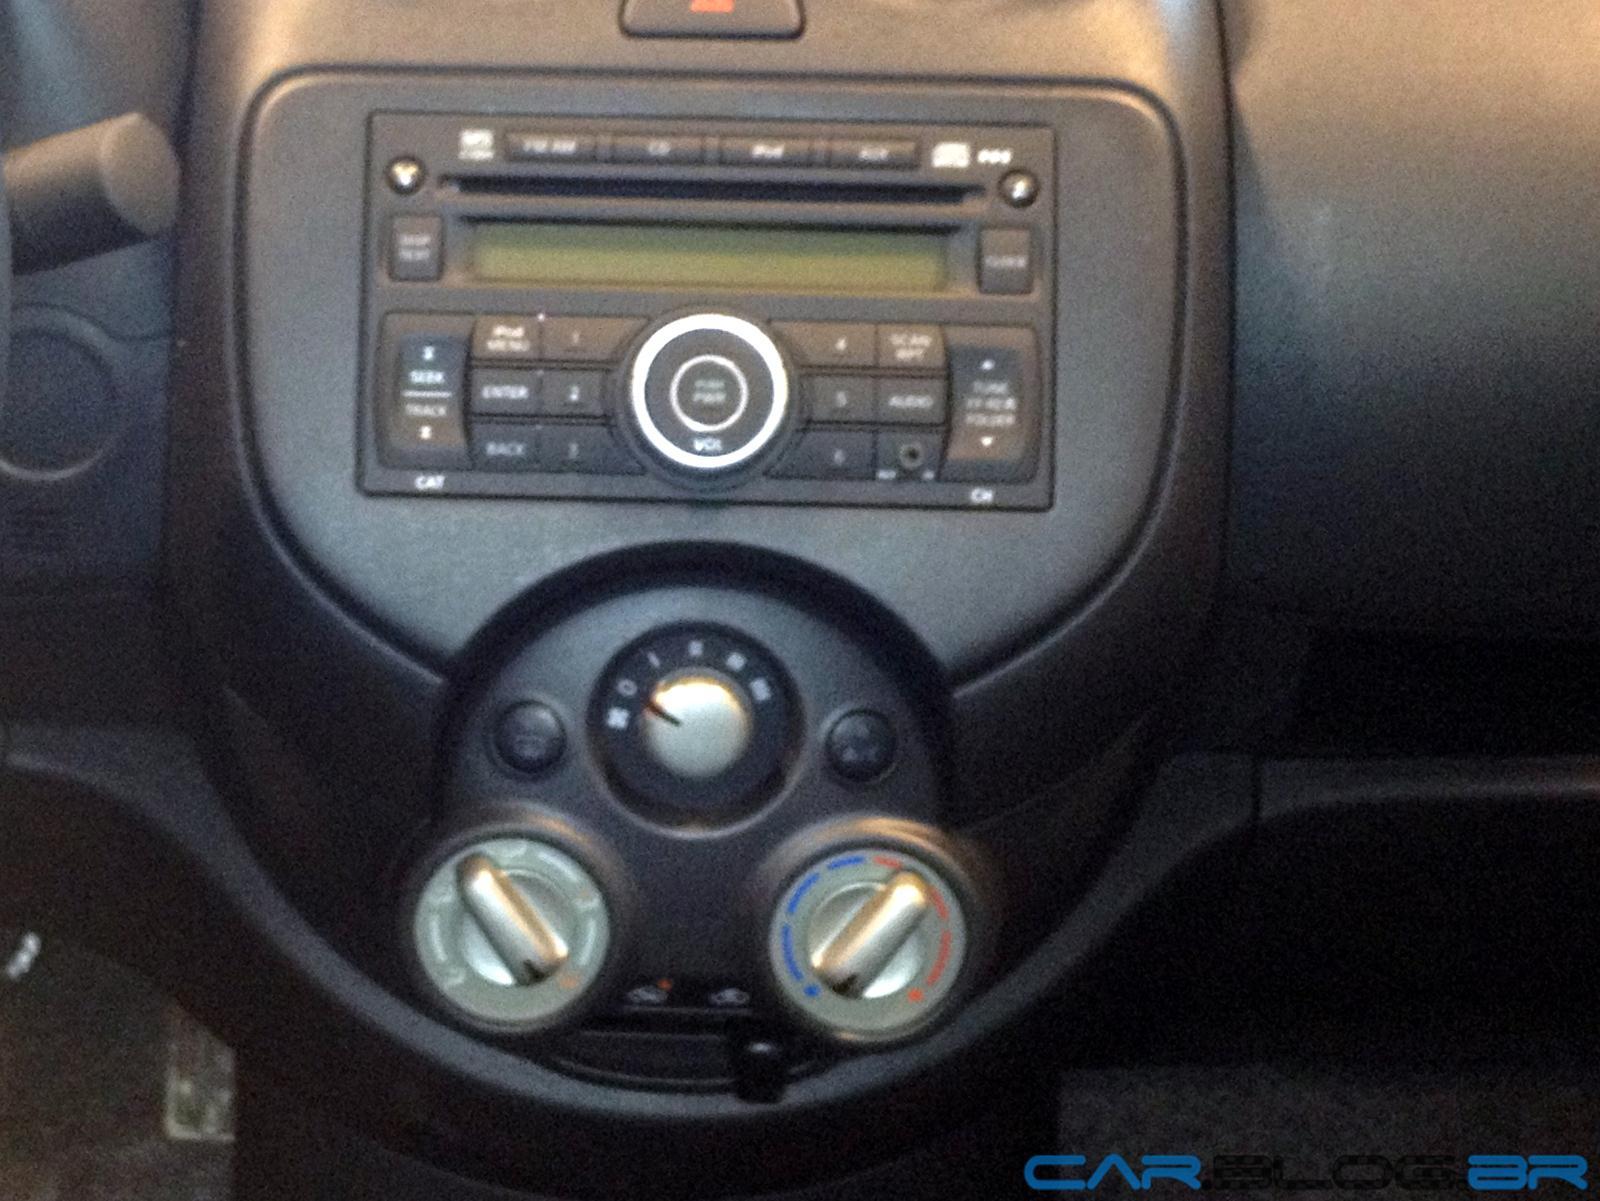 Nissan Versa SV 2013   Interior